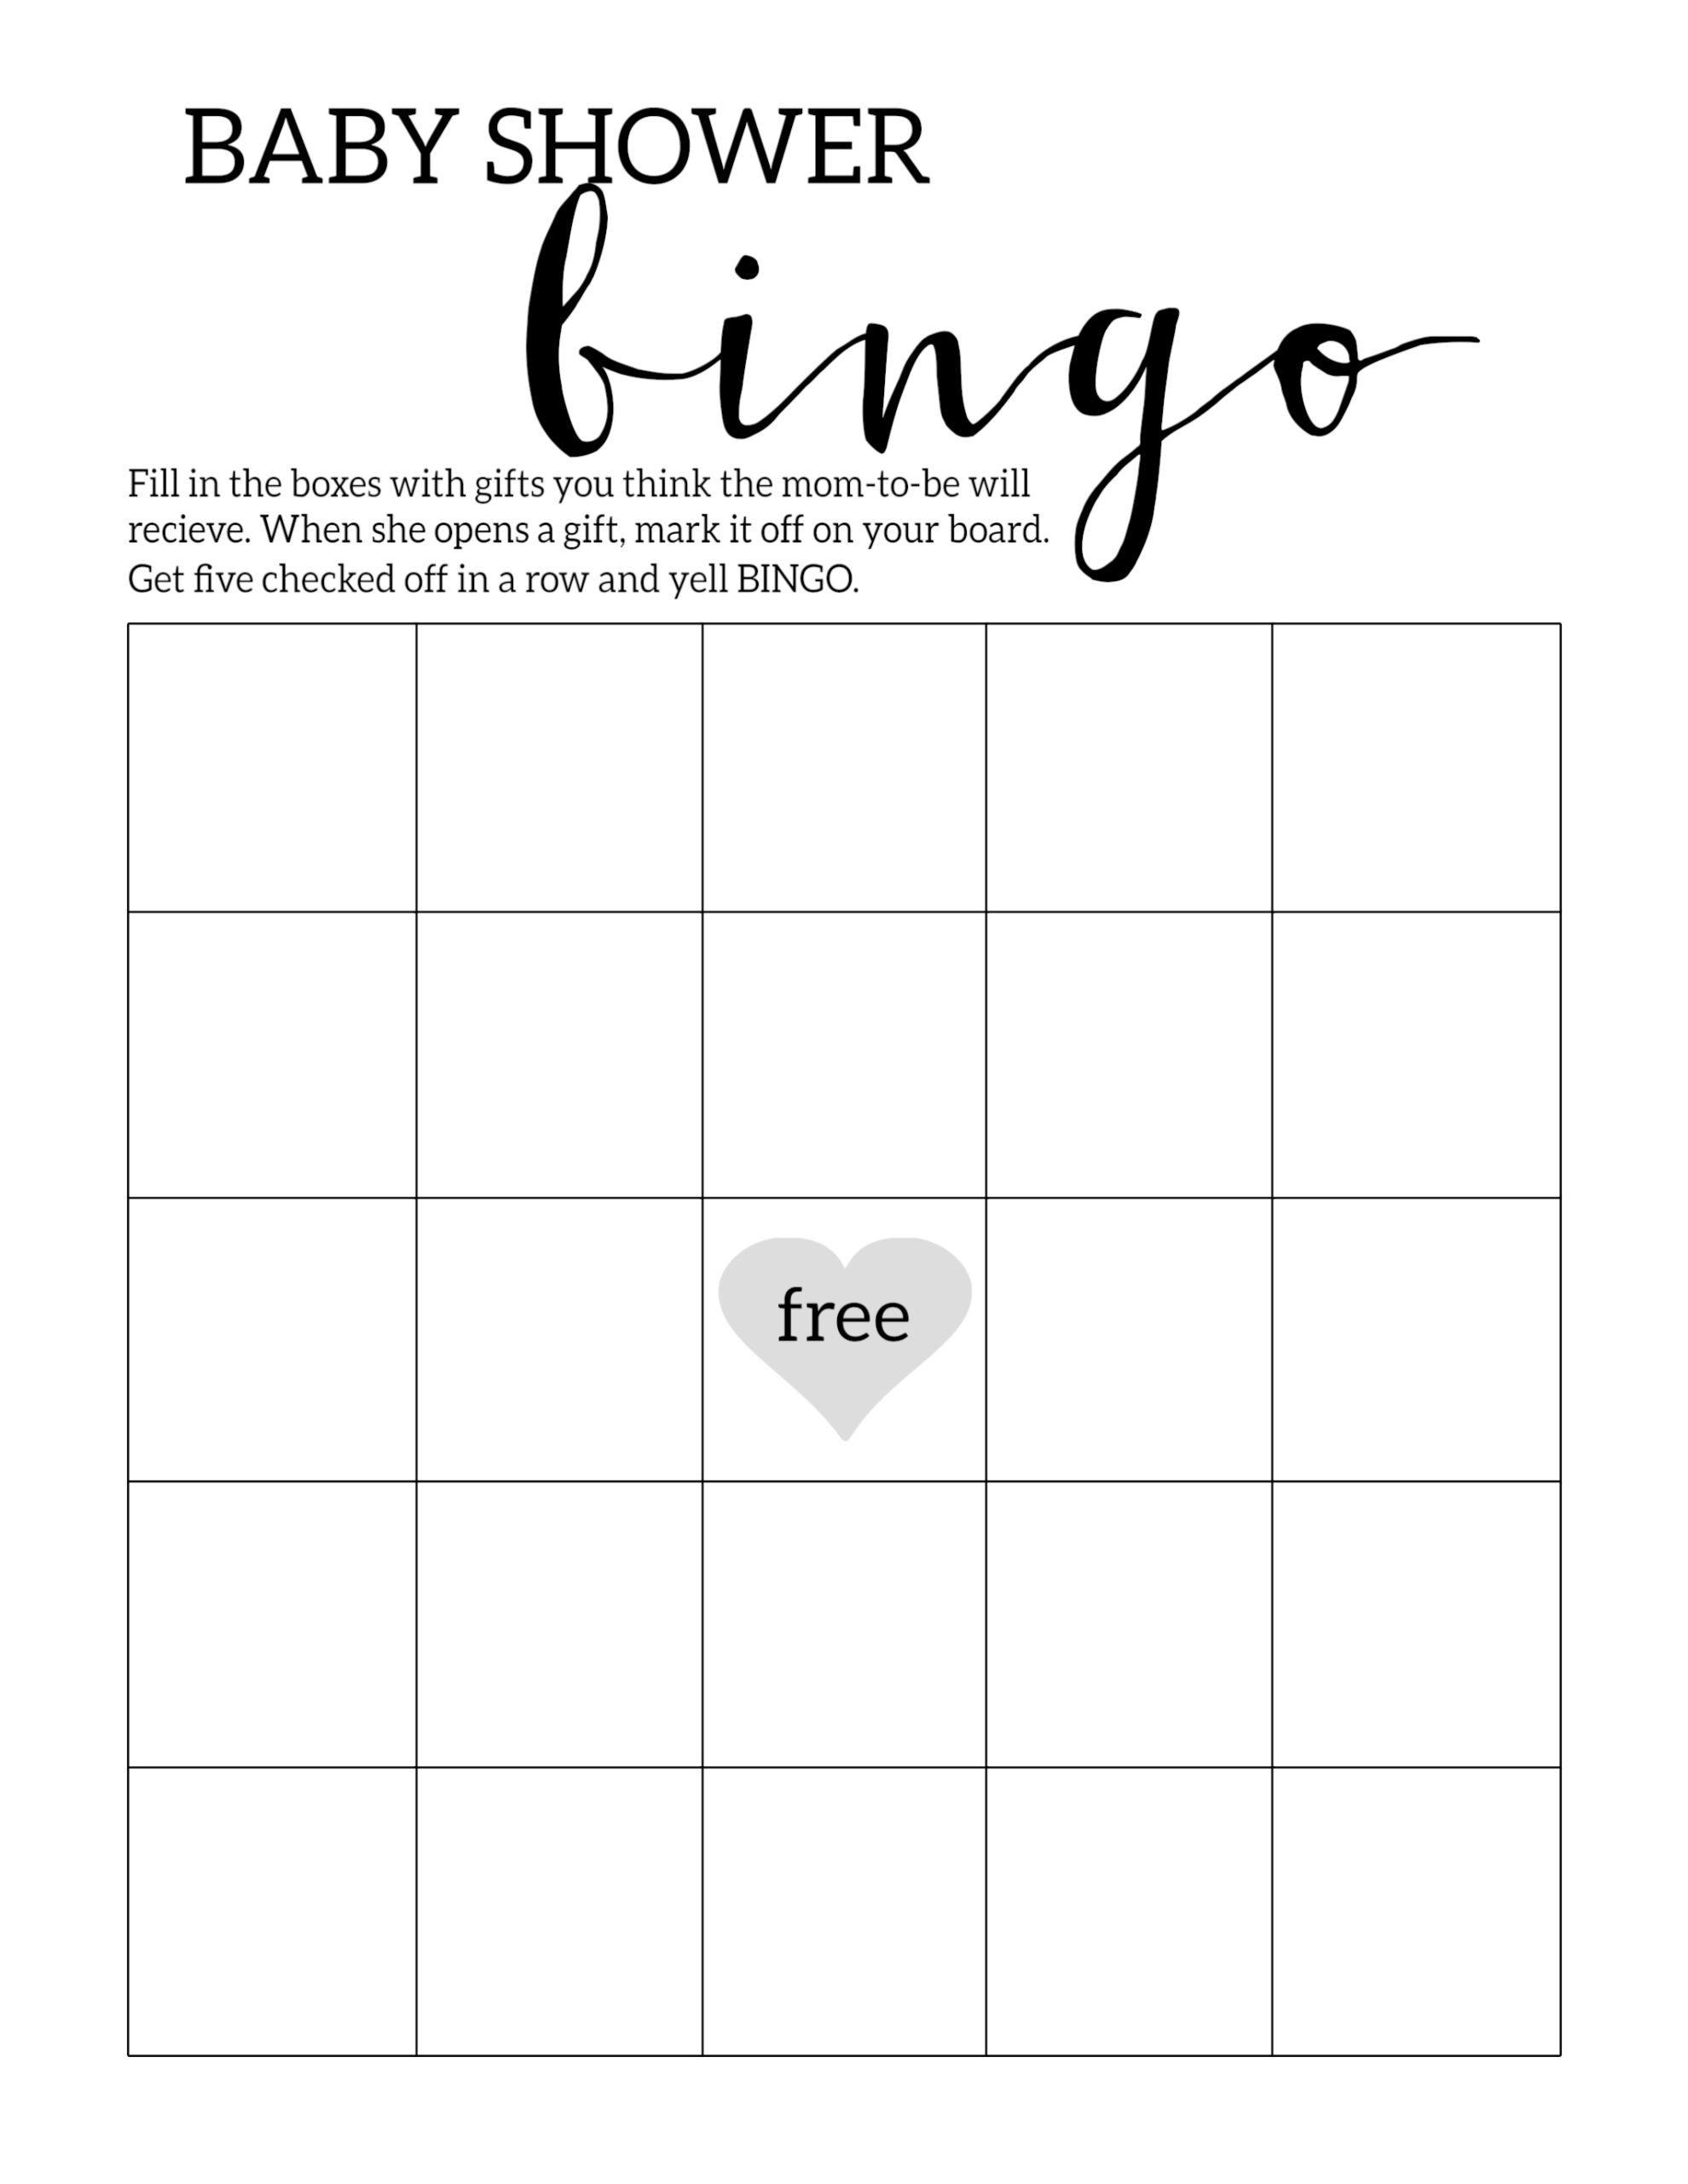 Baby Shower Bingo Printable Cards Template - Paper Trail Design - Baby Bingo Game Free Printable